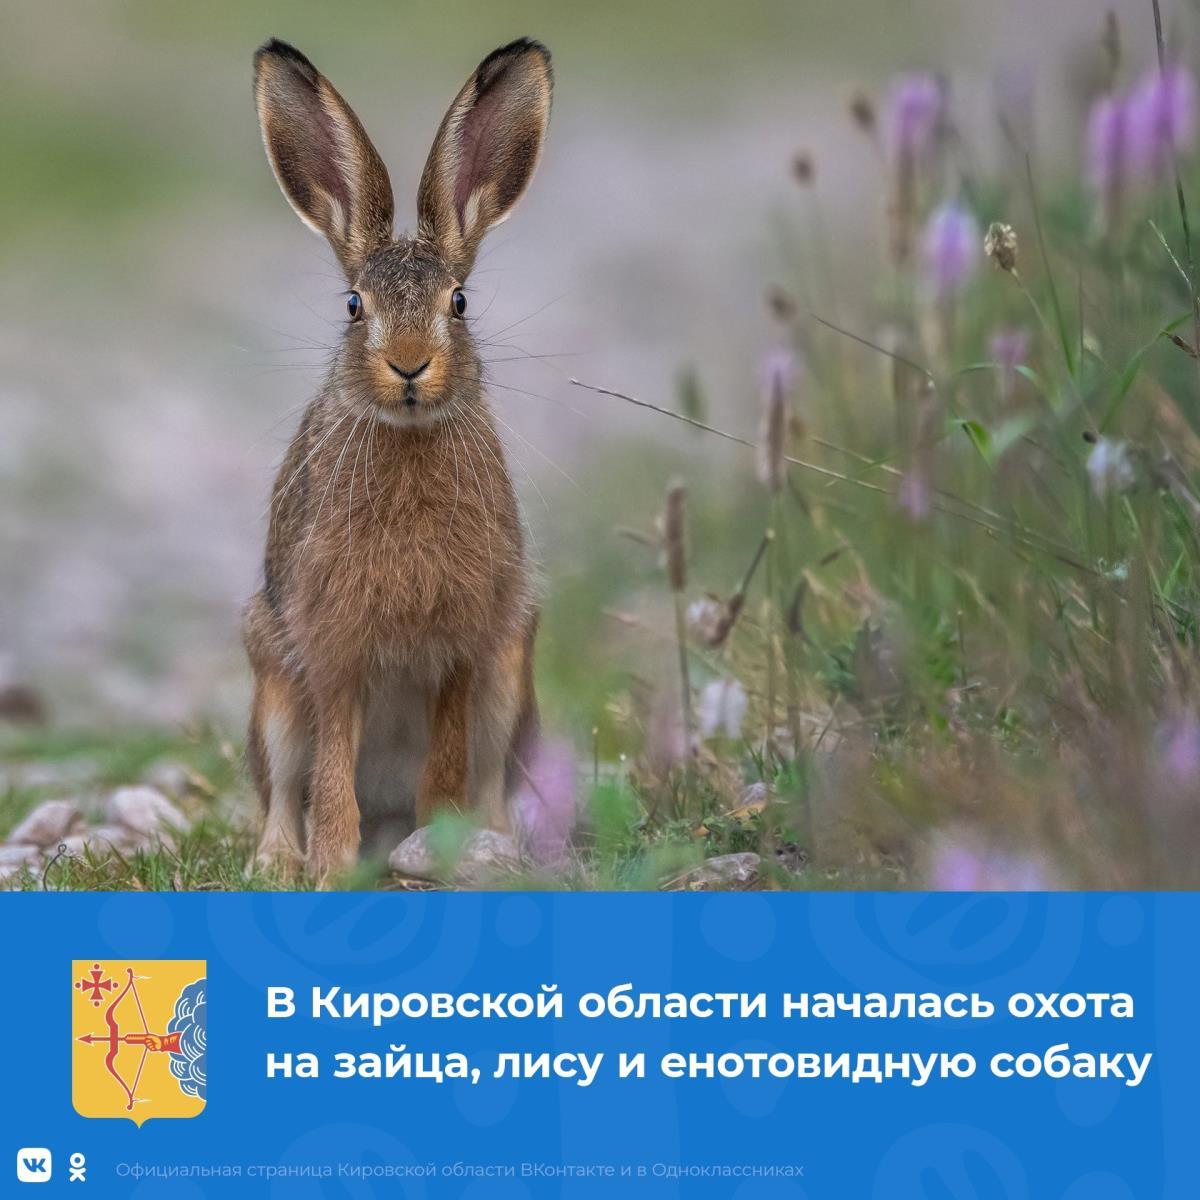 Началась охота на зайца, лису и енотовидную собаку